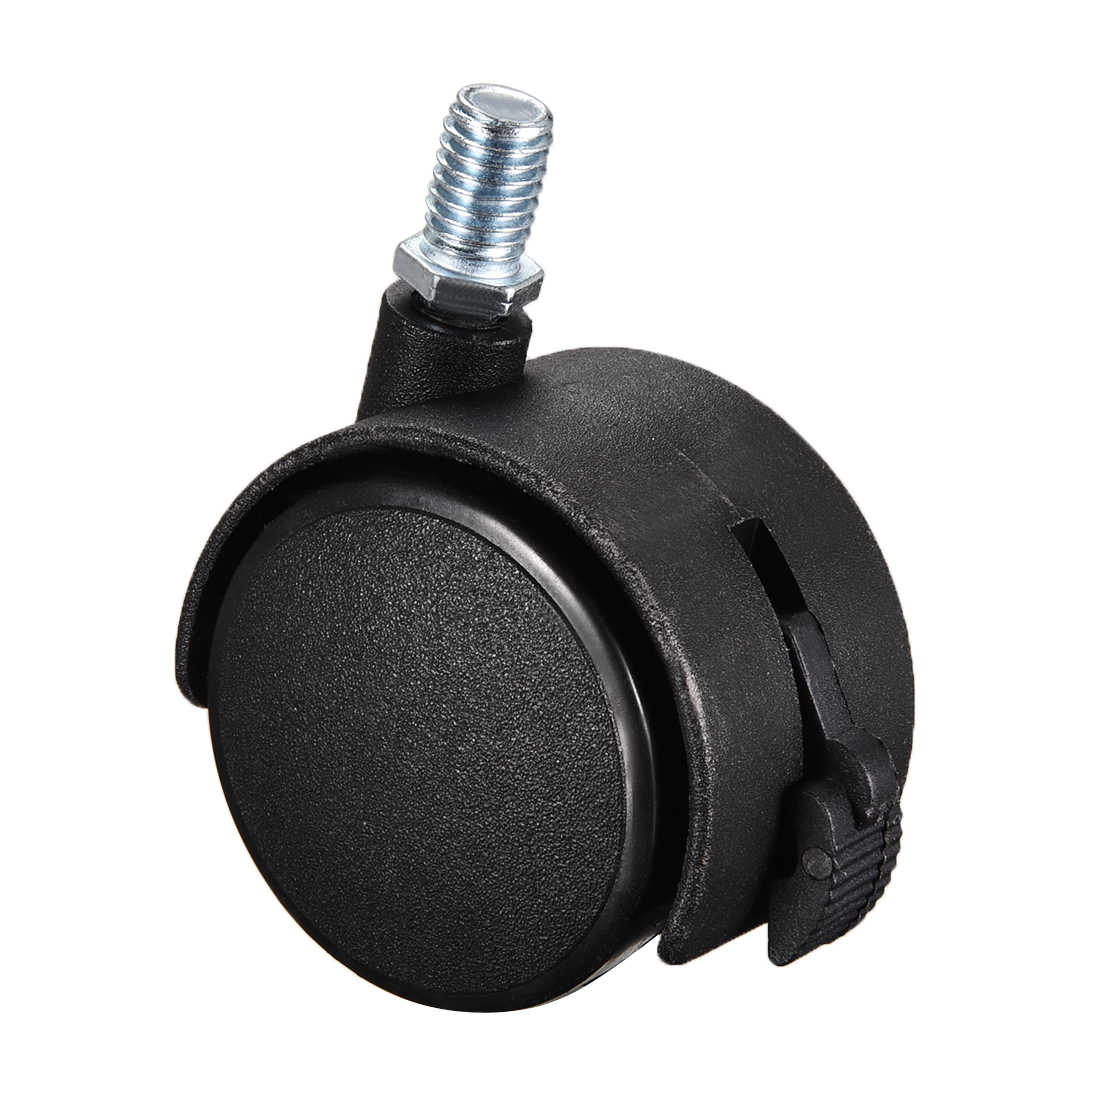 uxcell 4 Pcs 1.5 Inch Swivel Caster Wheels Nylon 360 Degree Threaded Stem Caster Wheel 33lb Capacity M8 x 20mm